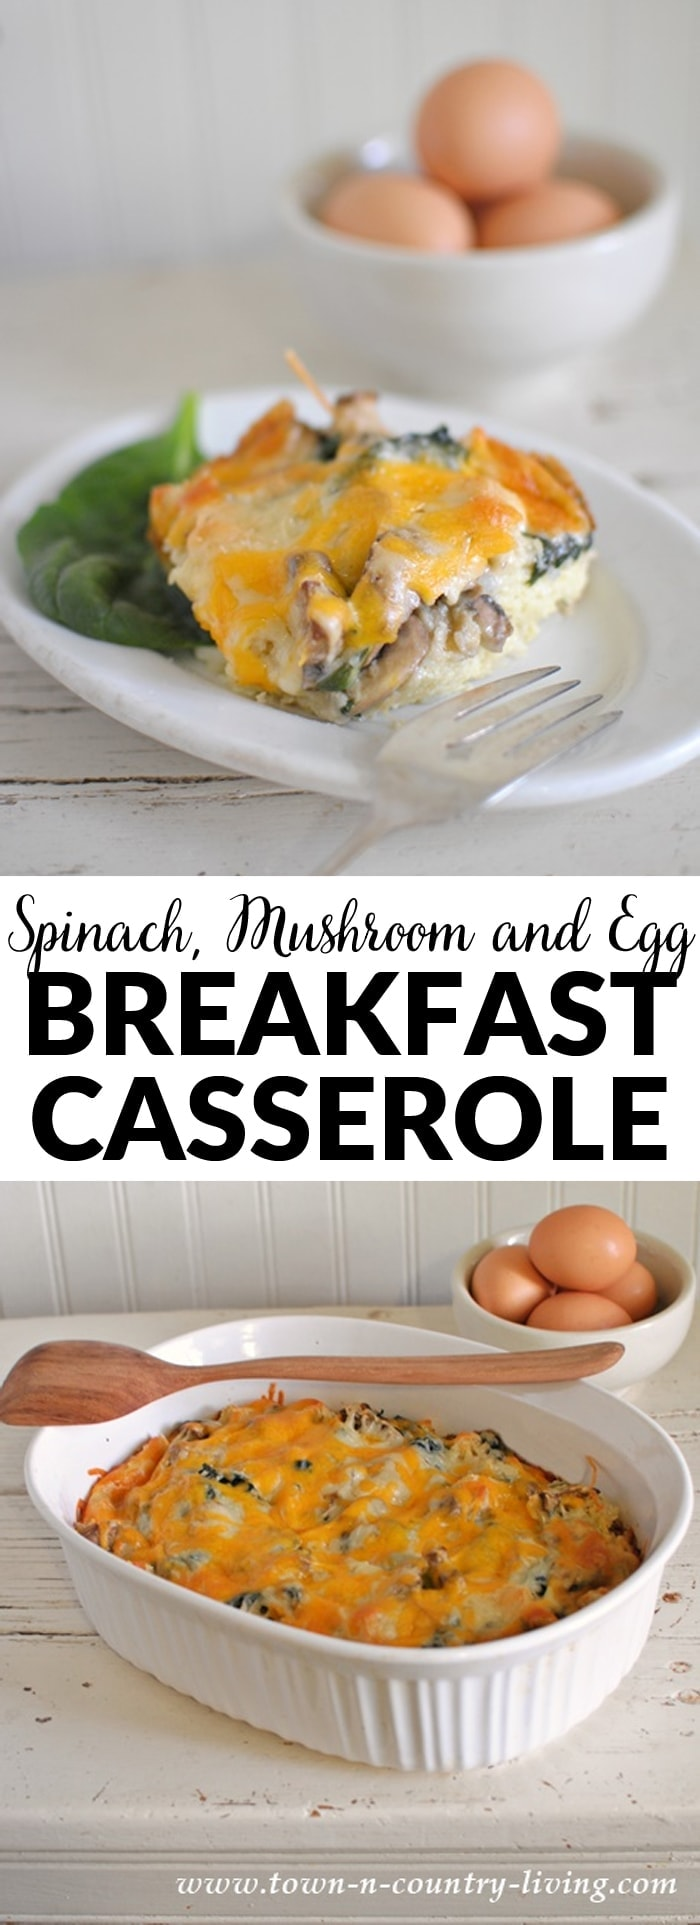 Spinach, Mushroom and Egg Breakfast Casserole